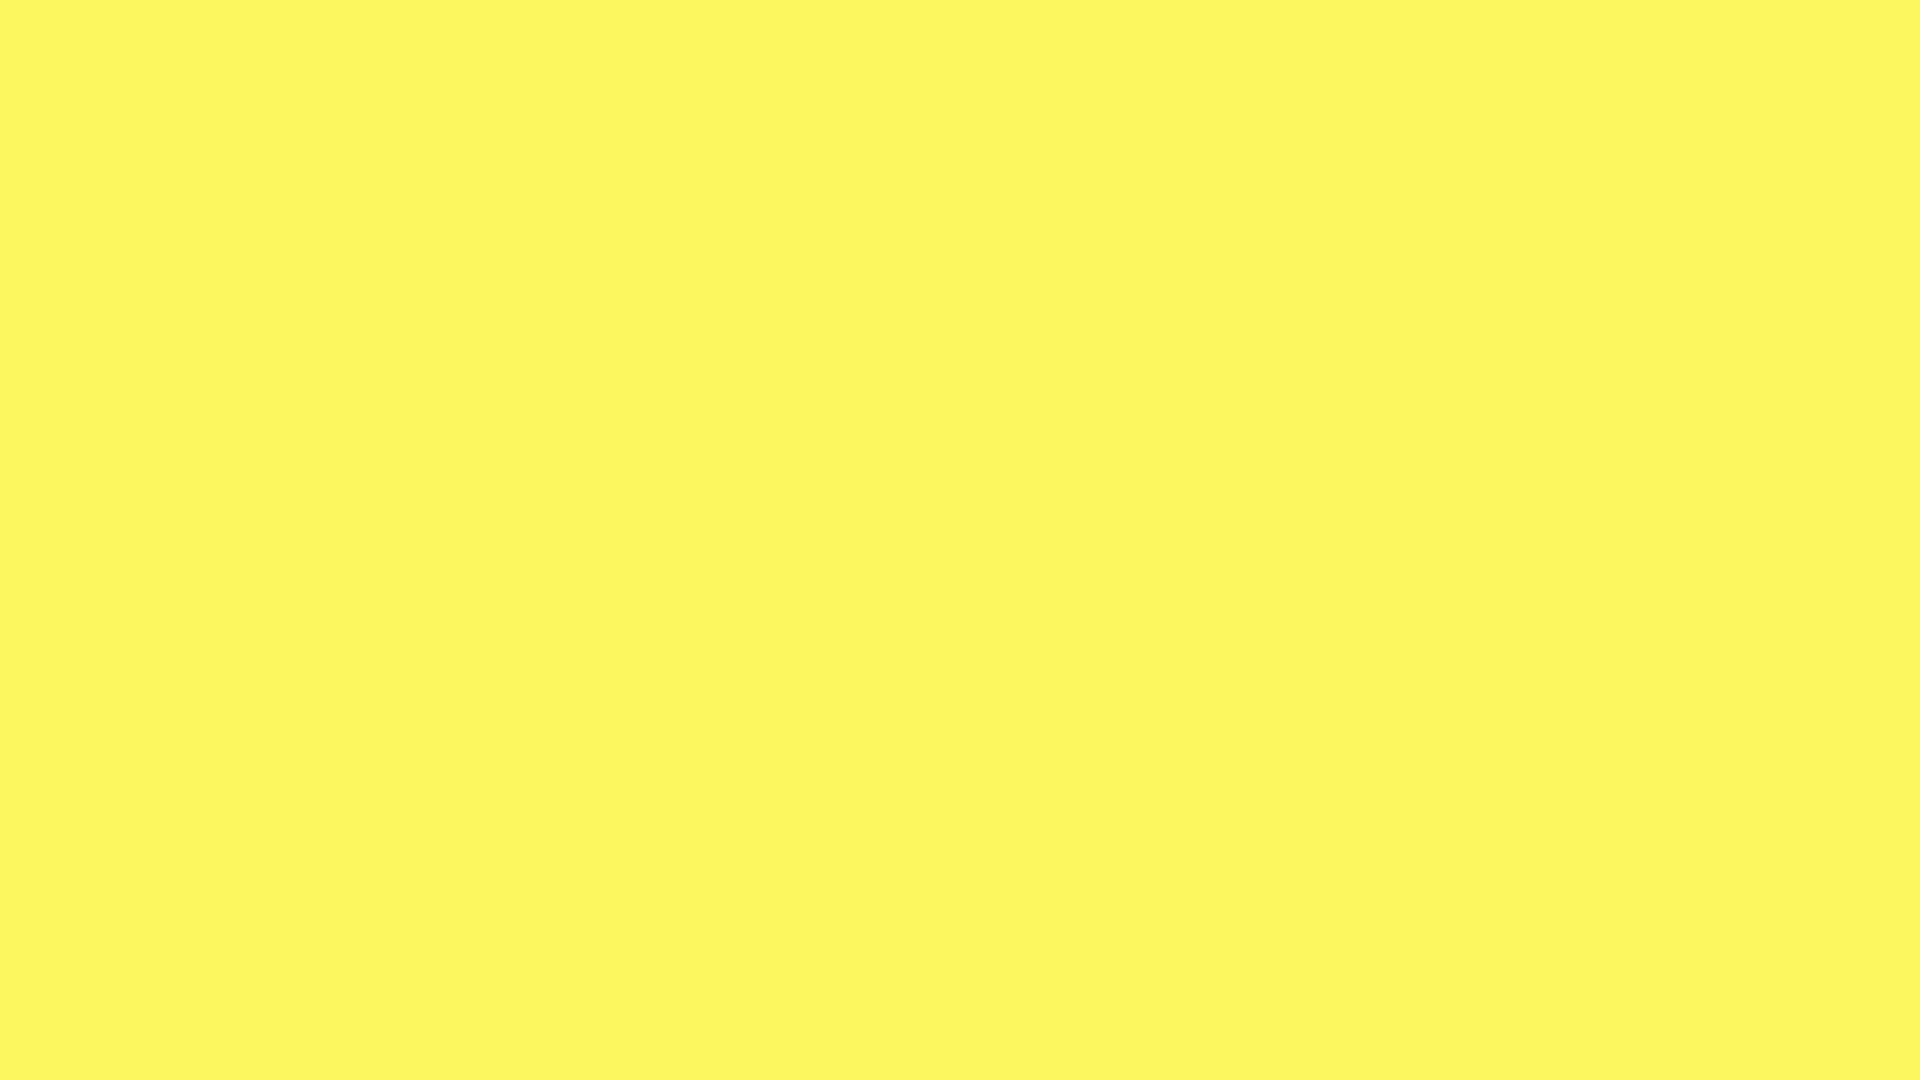 1920x1080 Icterine Solid Color Background